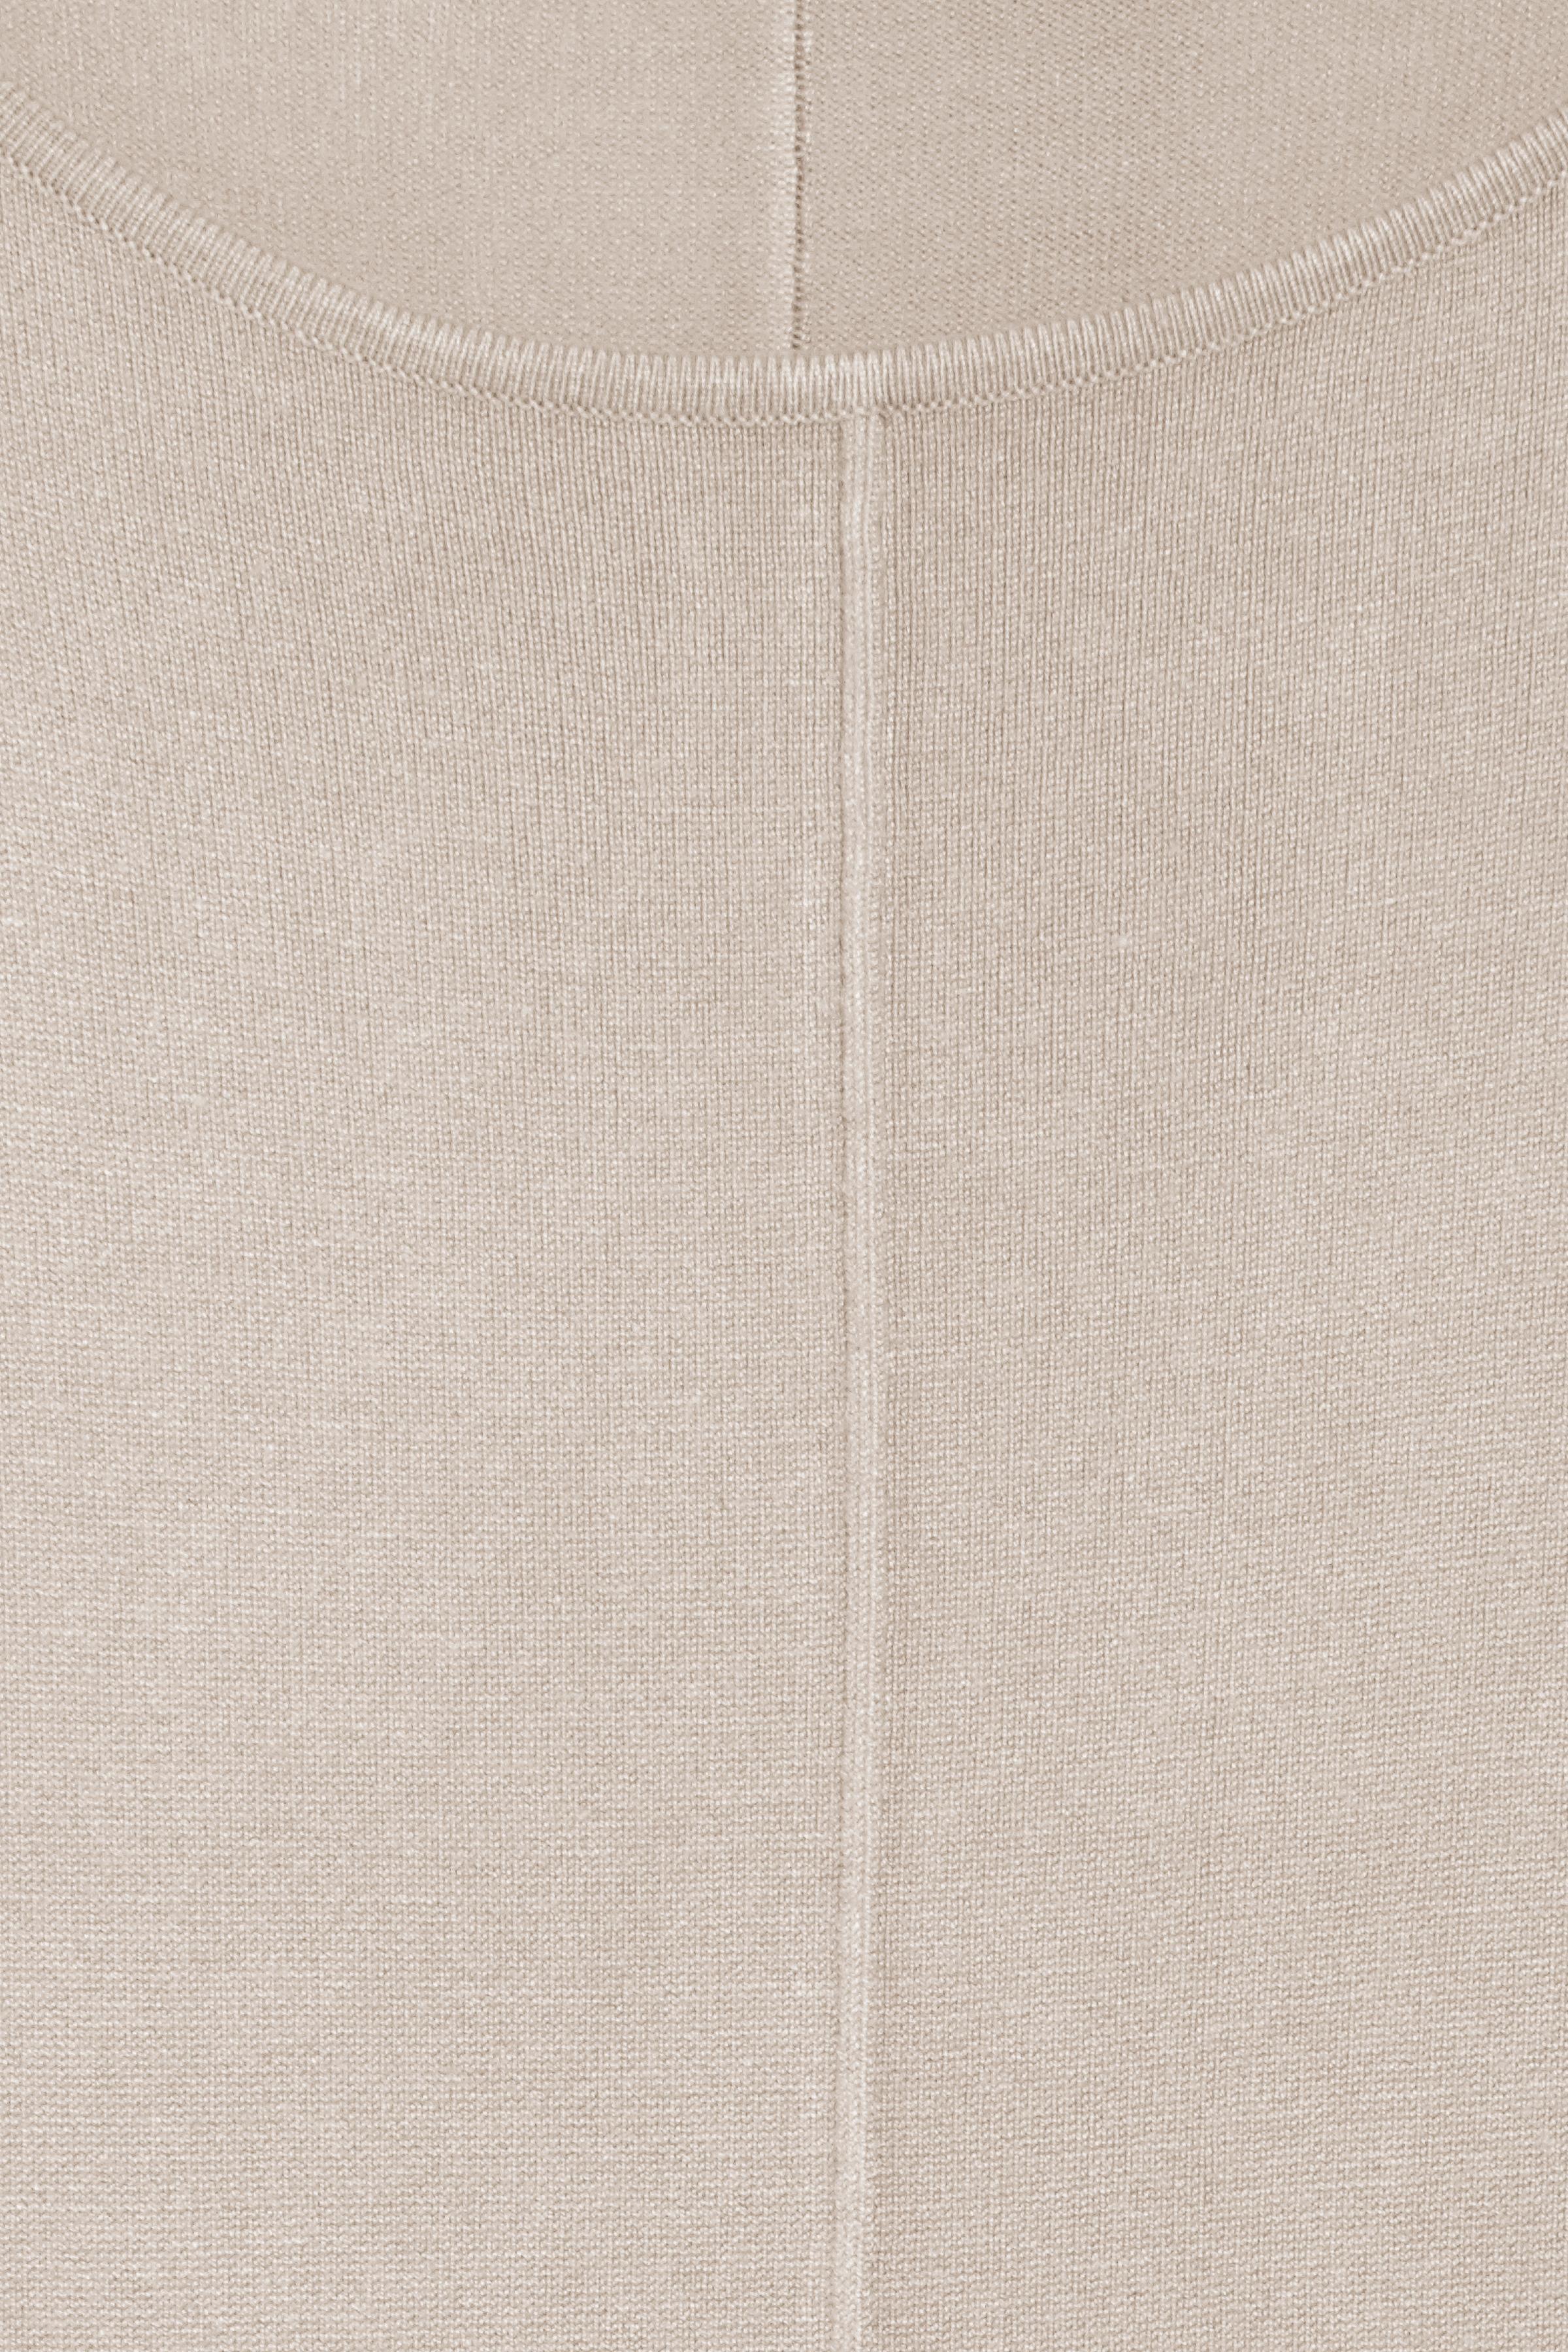 MEL. Moonlight Pullover van b.young – Koop MEL. Moonlight Pullover hier van size XS-XXL